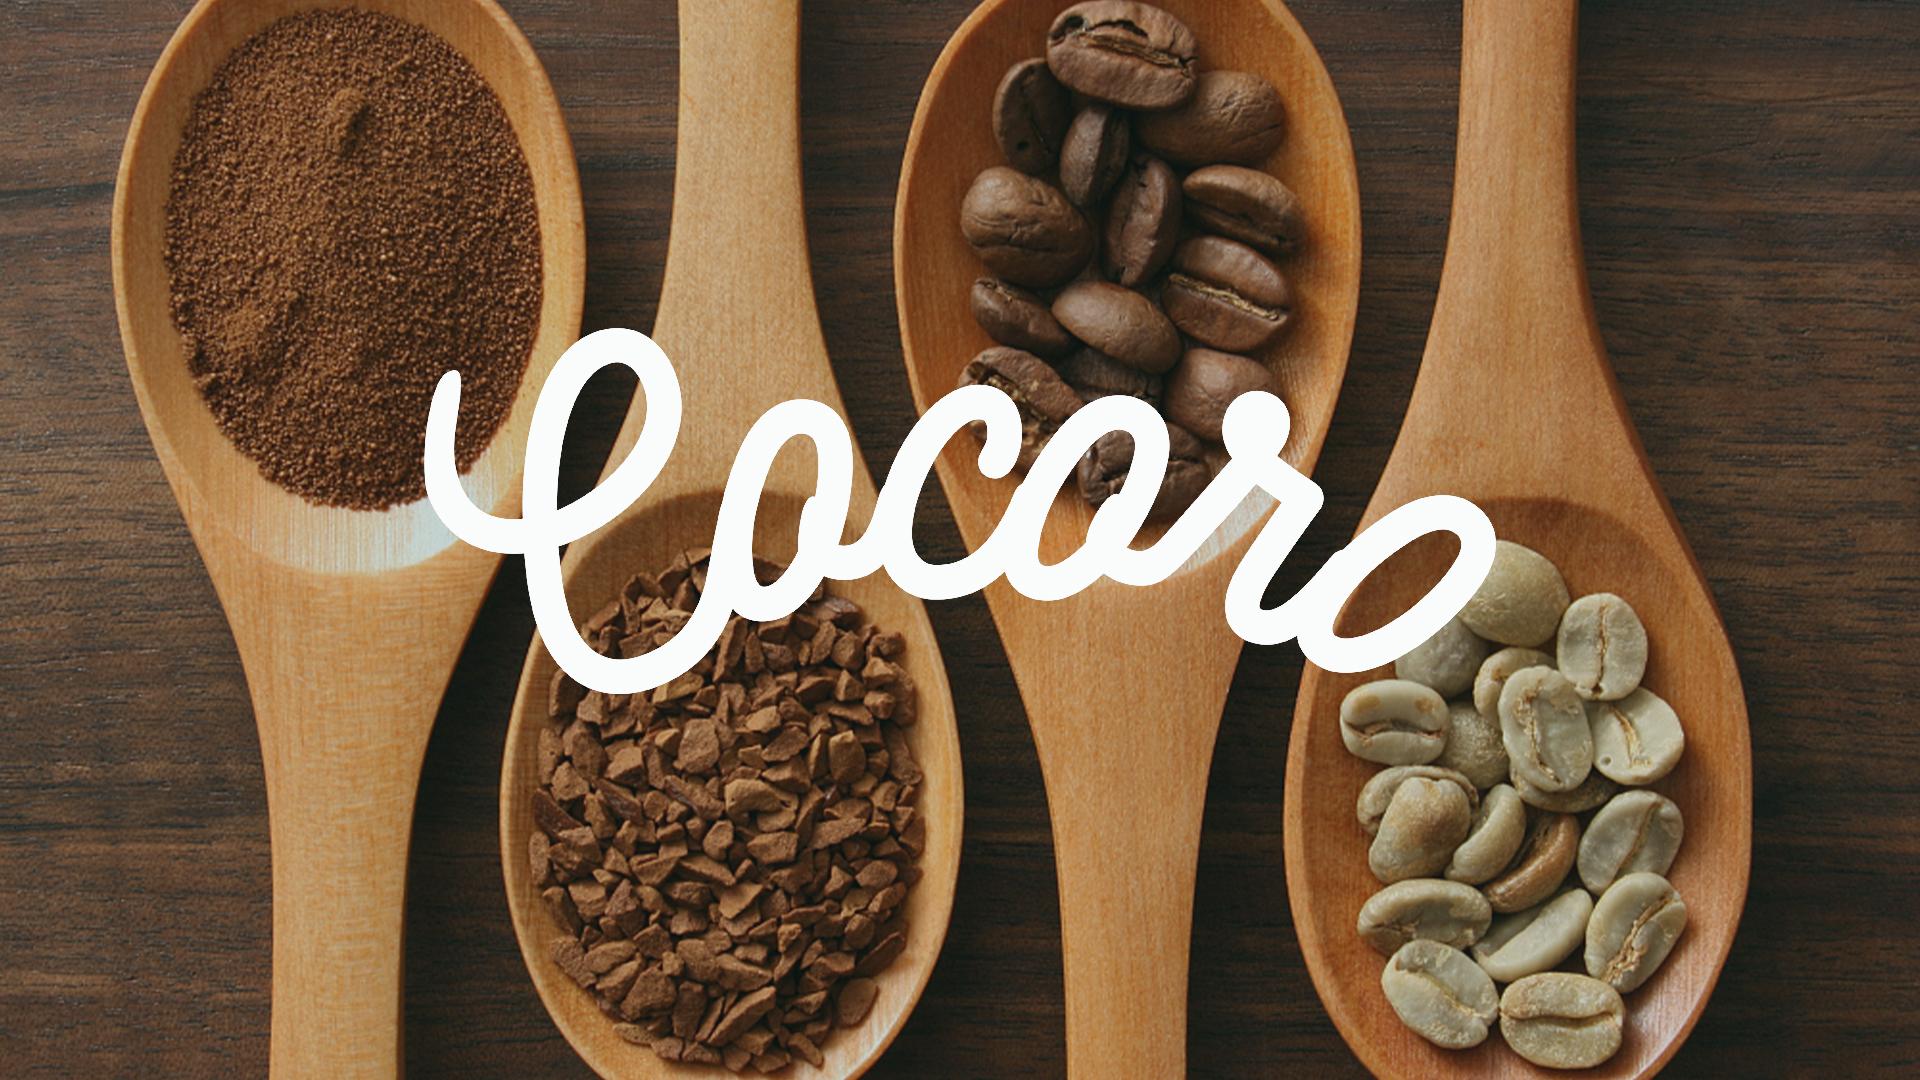 cocoro咖啡厅品牌logo设计-反白底效果